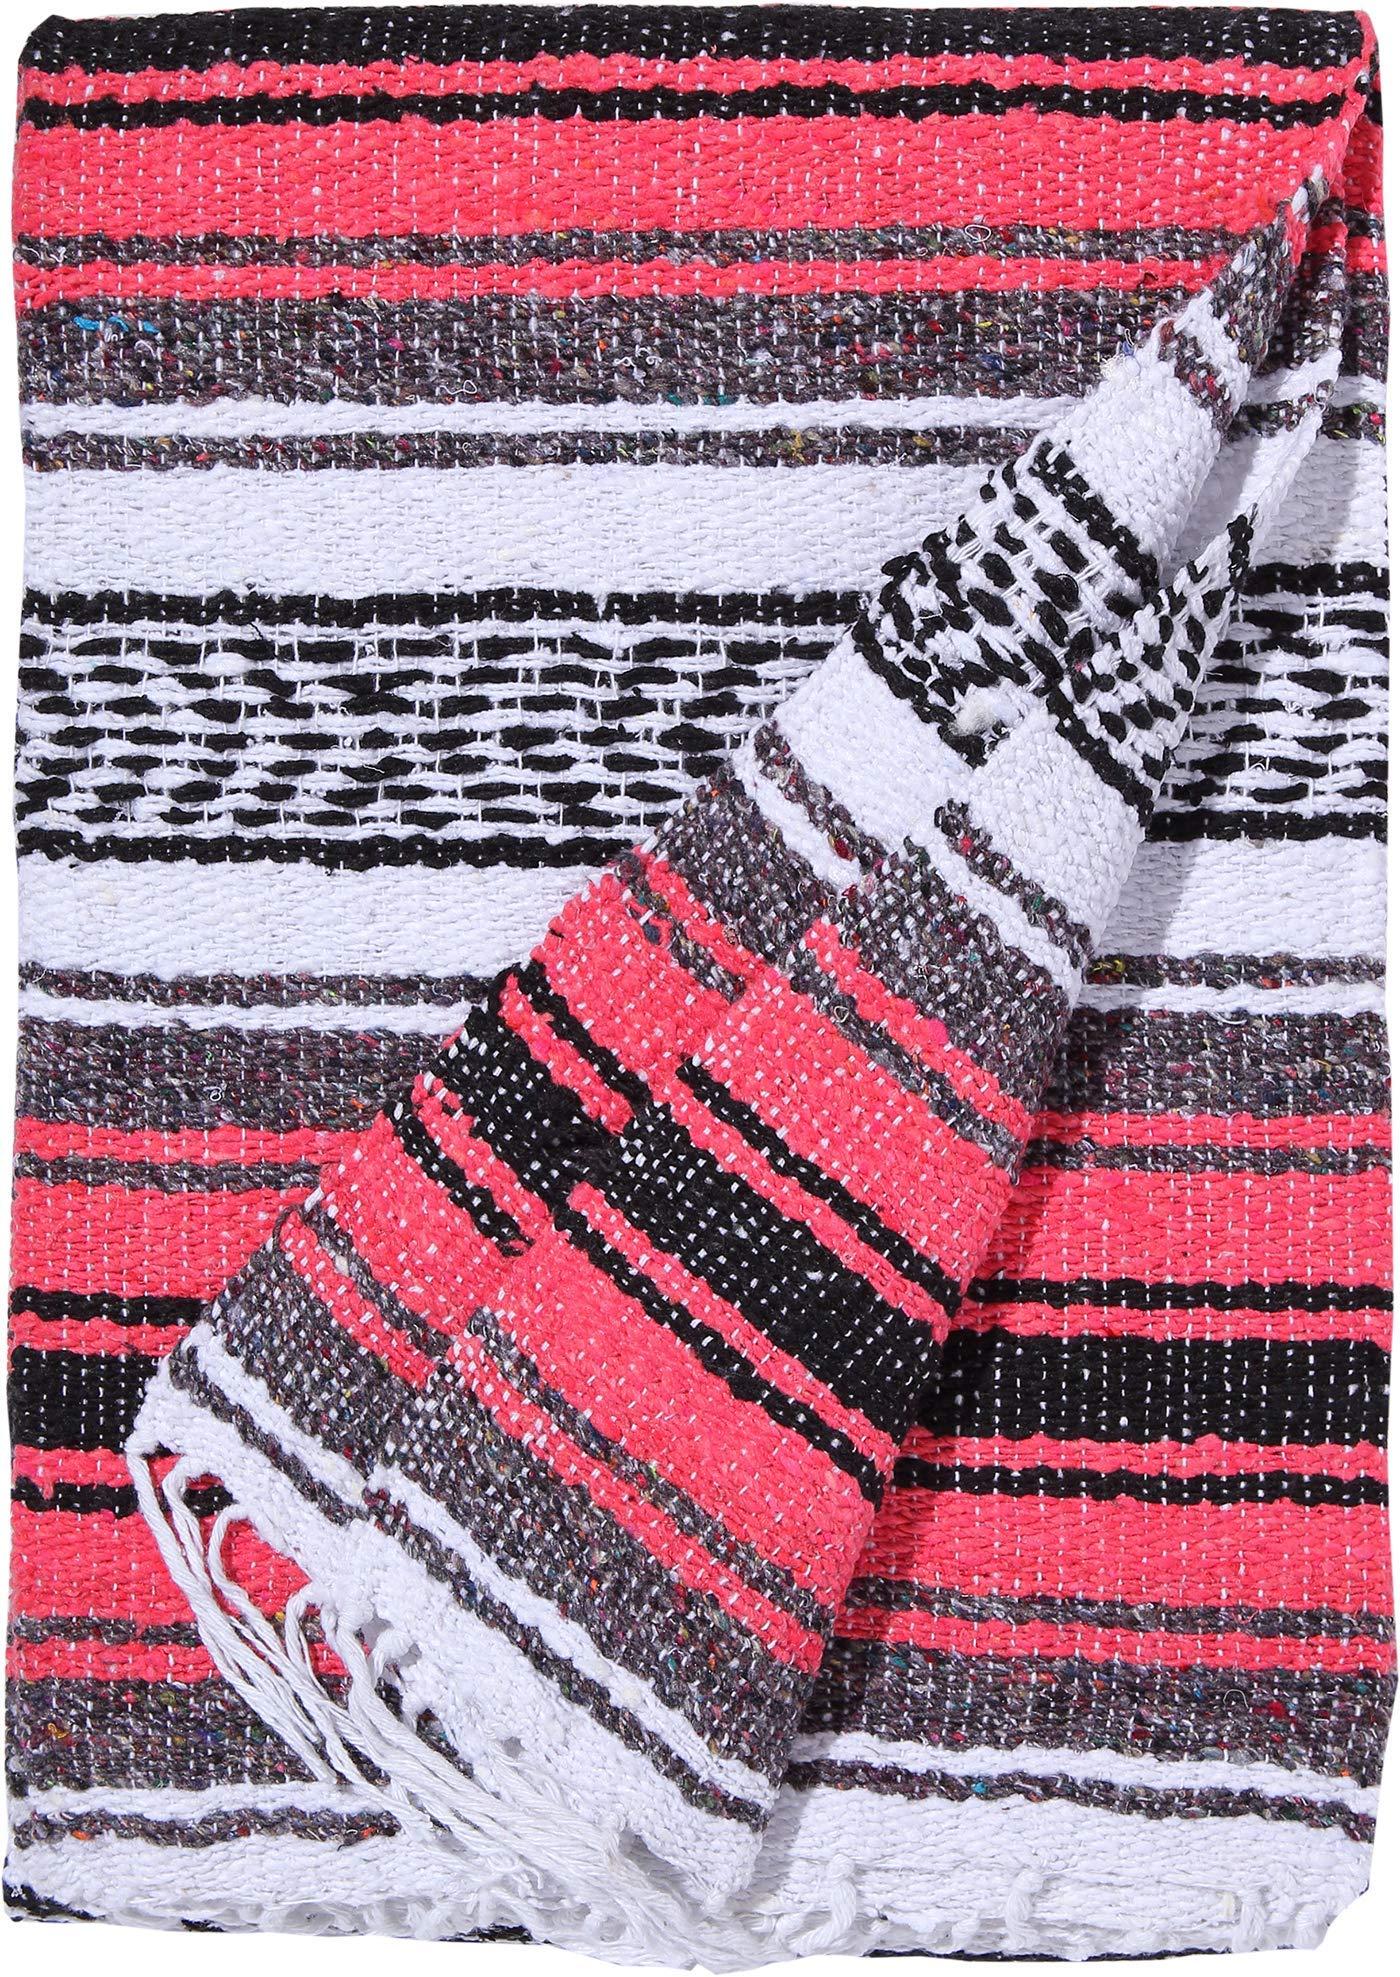 El Paso Designs Genuine Mexican Falsa Blanket - Yoga Studio Blanket, Colorful, Soft Woven Serape Imported from Mexico (Bright Coral) by El Paso Designs (Image #2)